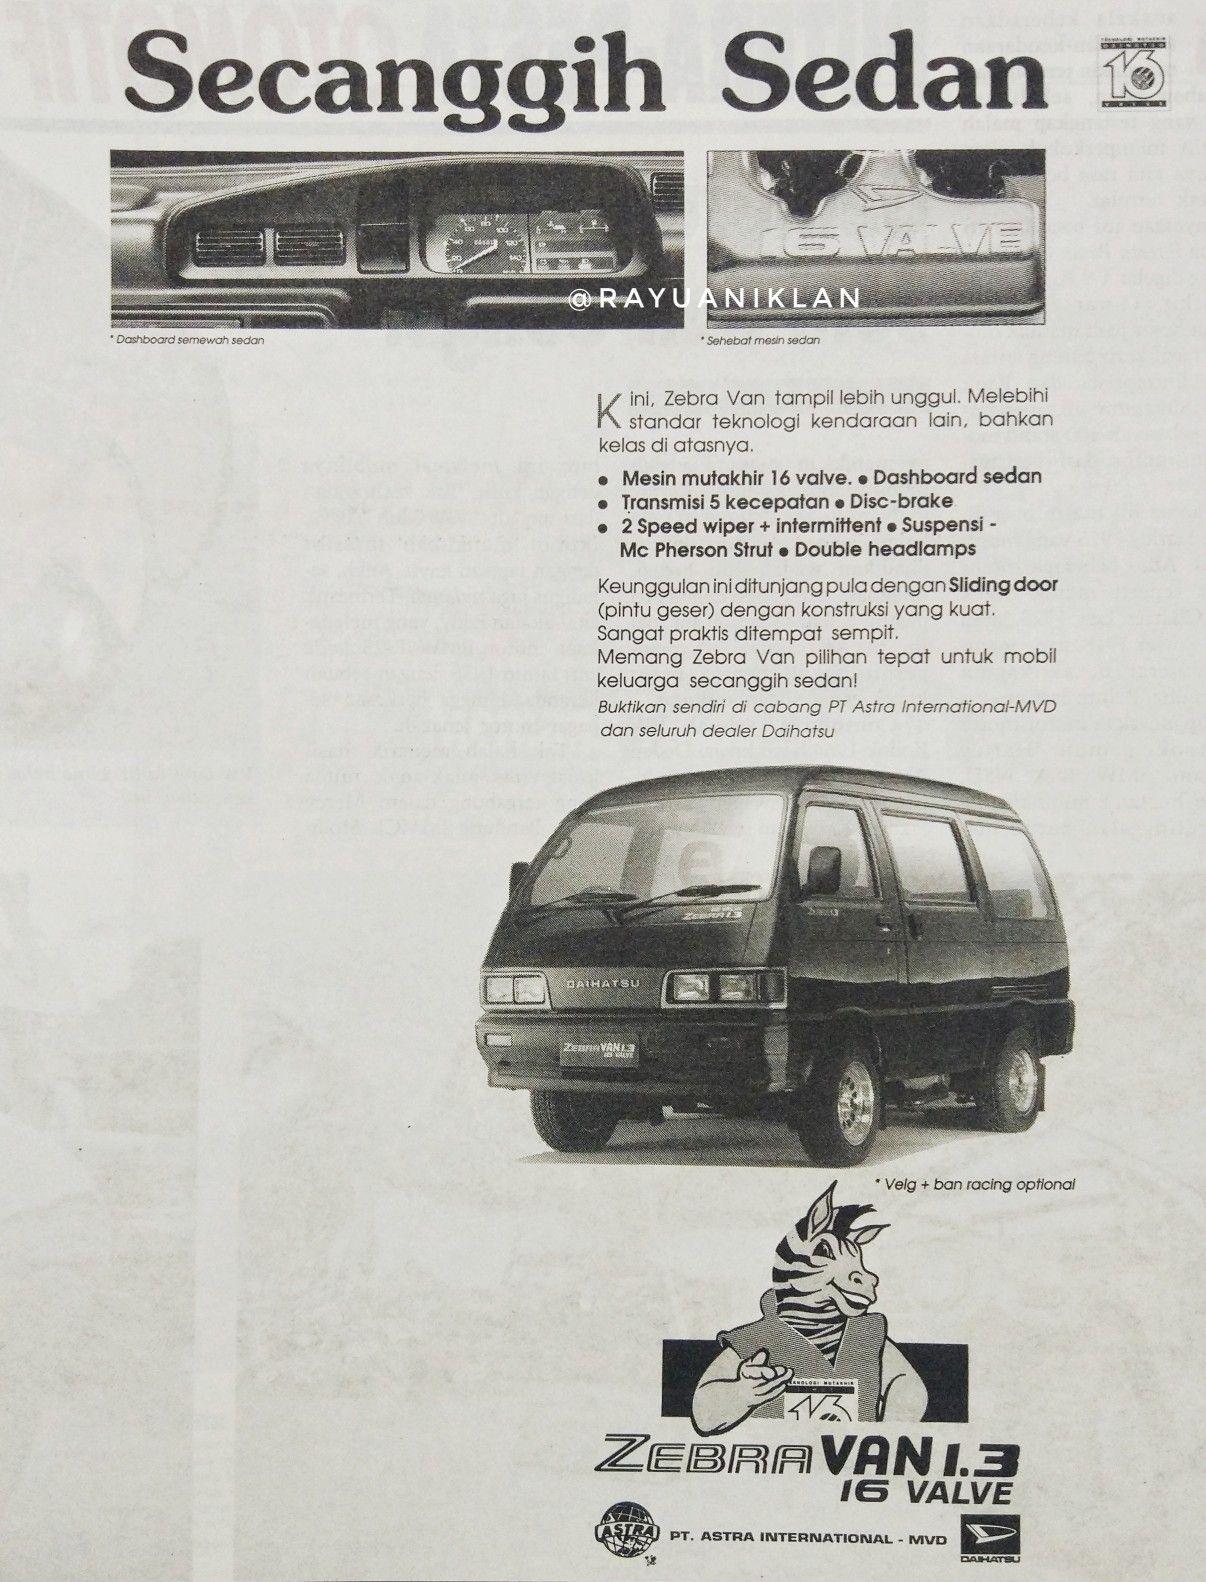 Daihatsu Zebra Rasa Sedan Sedan Zebra Van